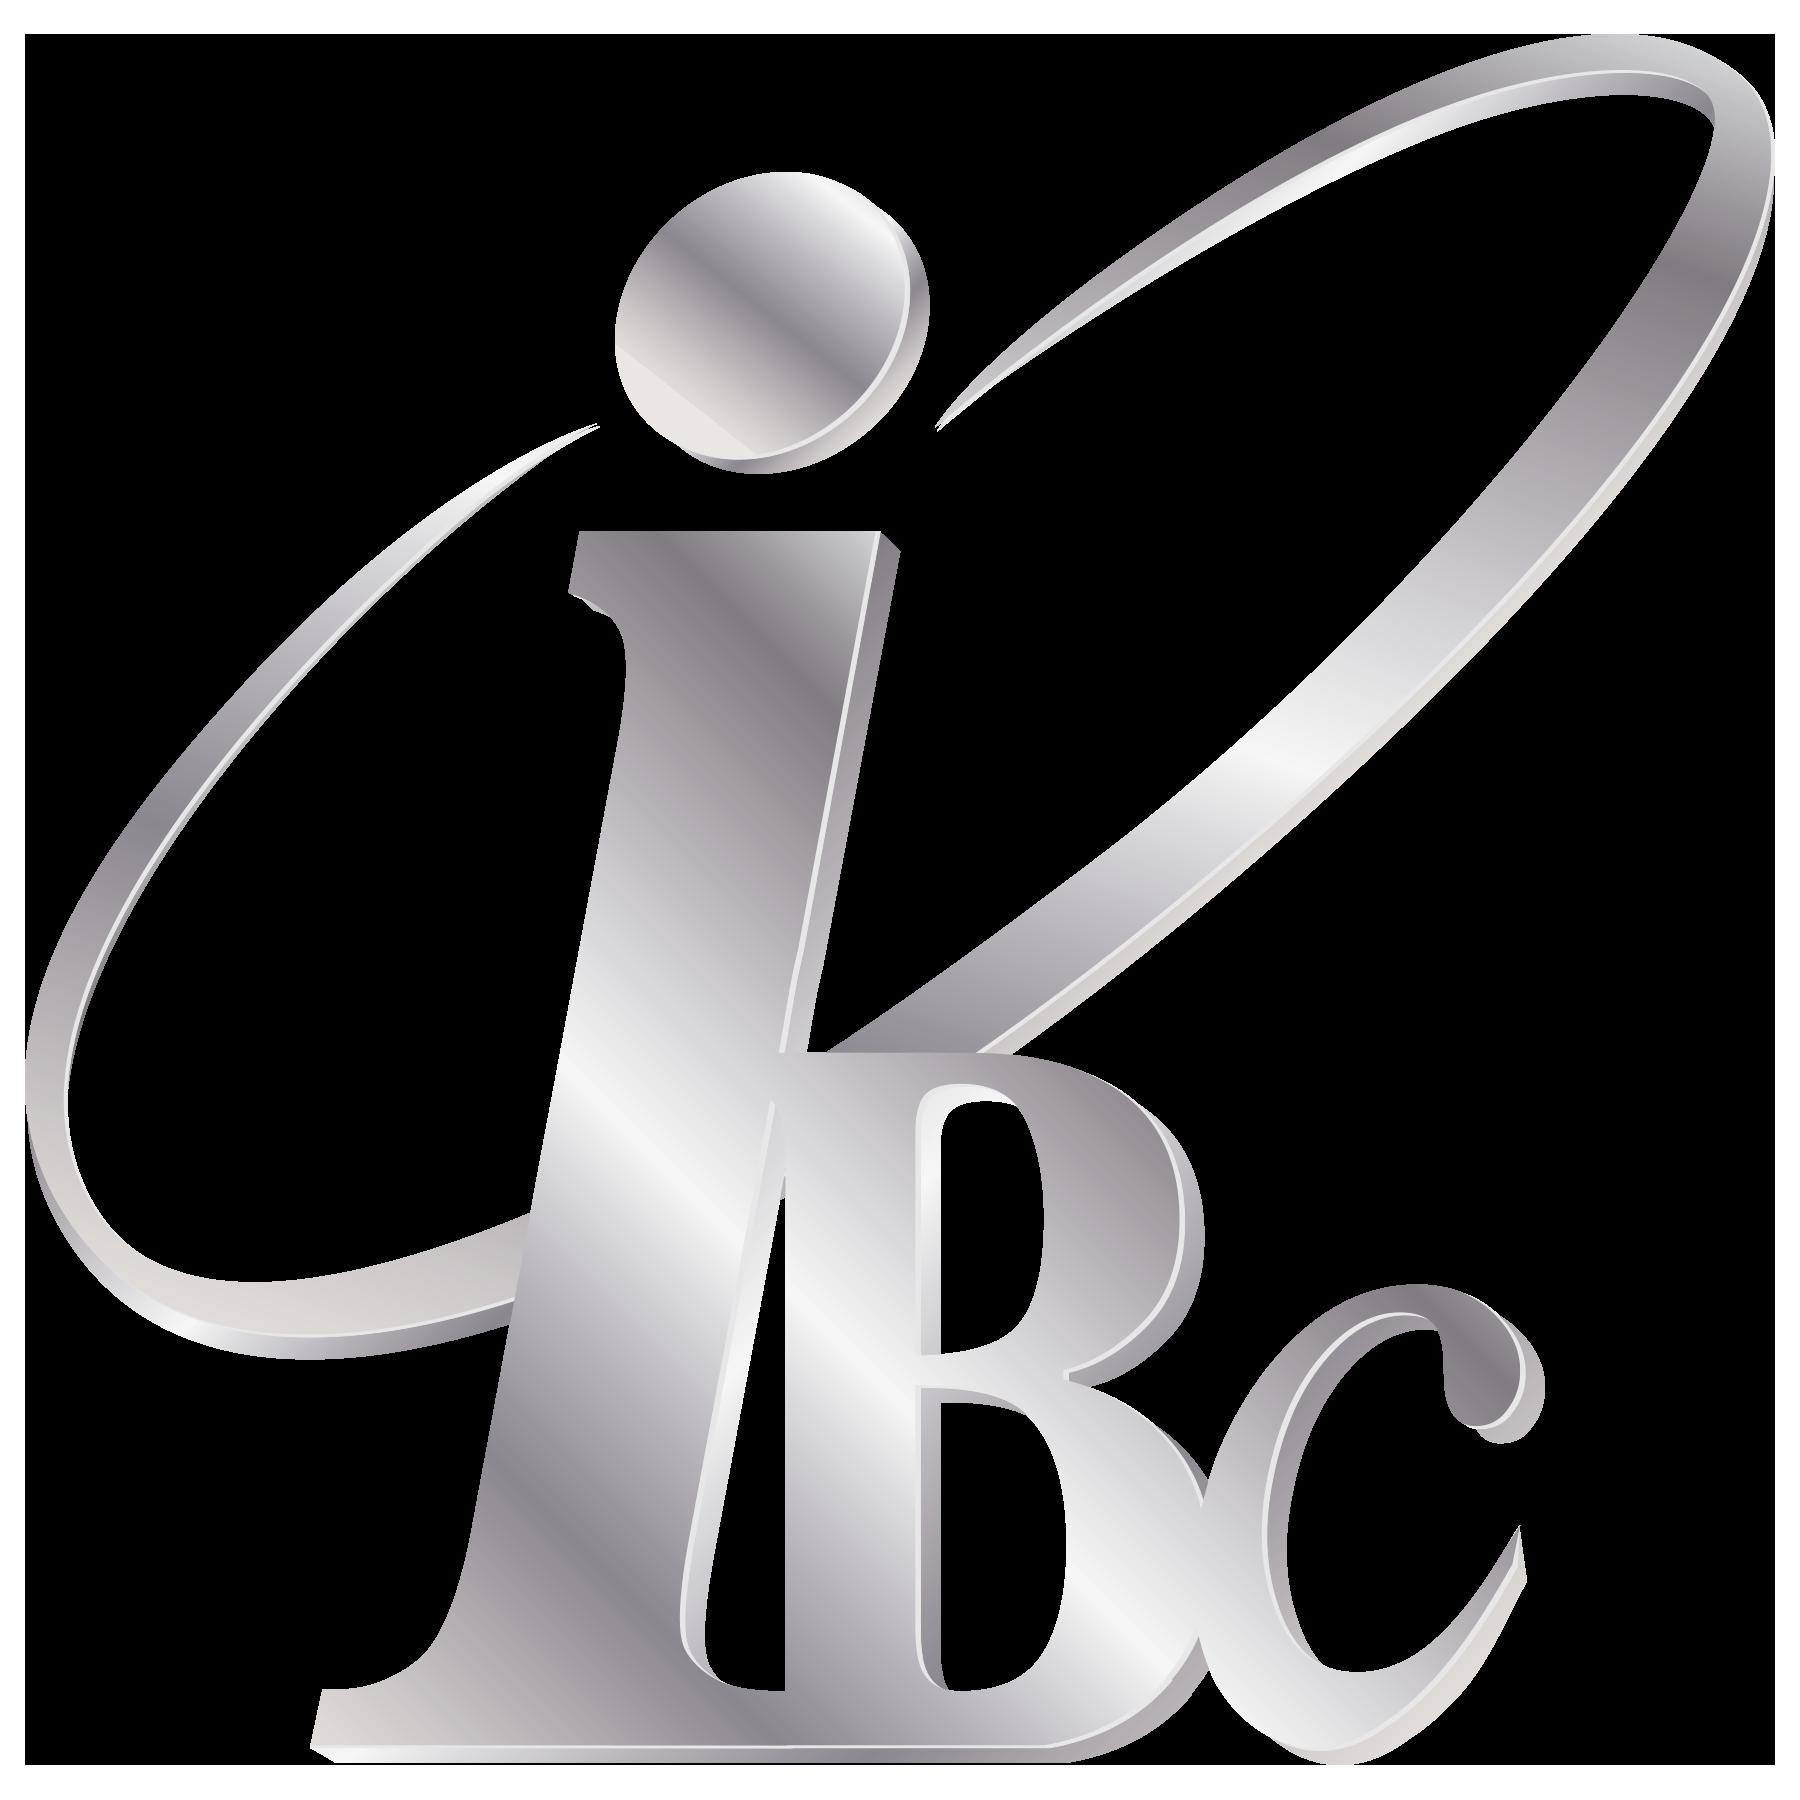 IBC Silver